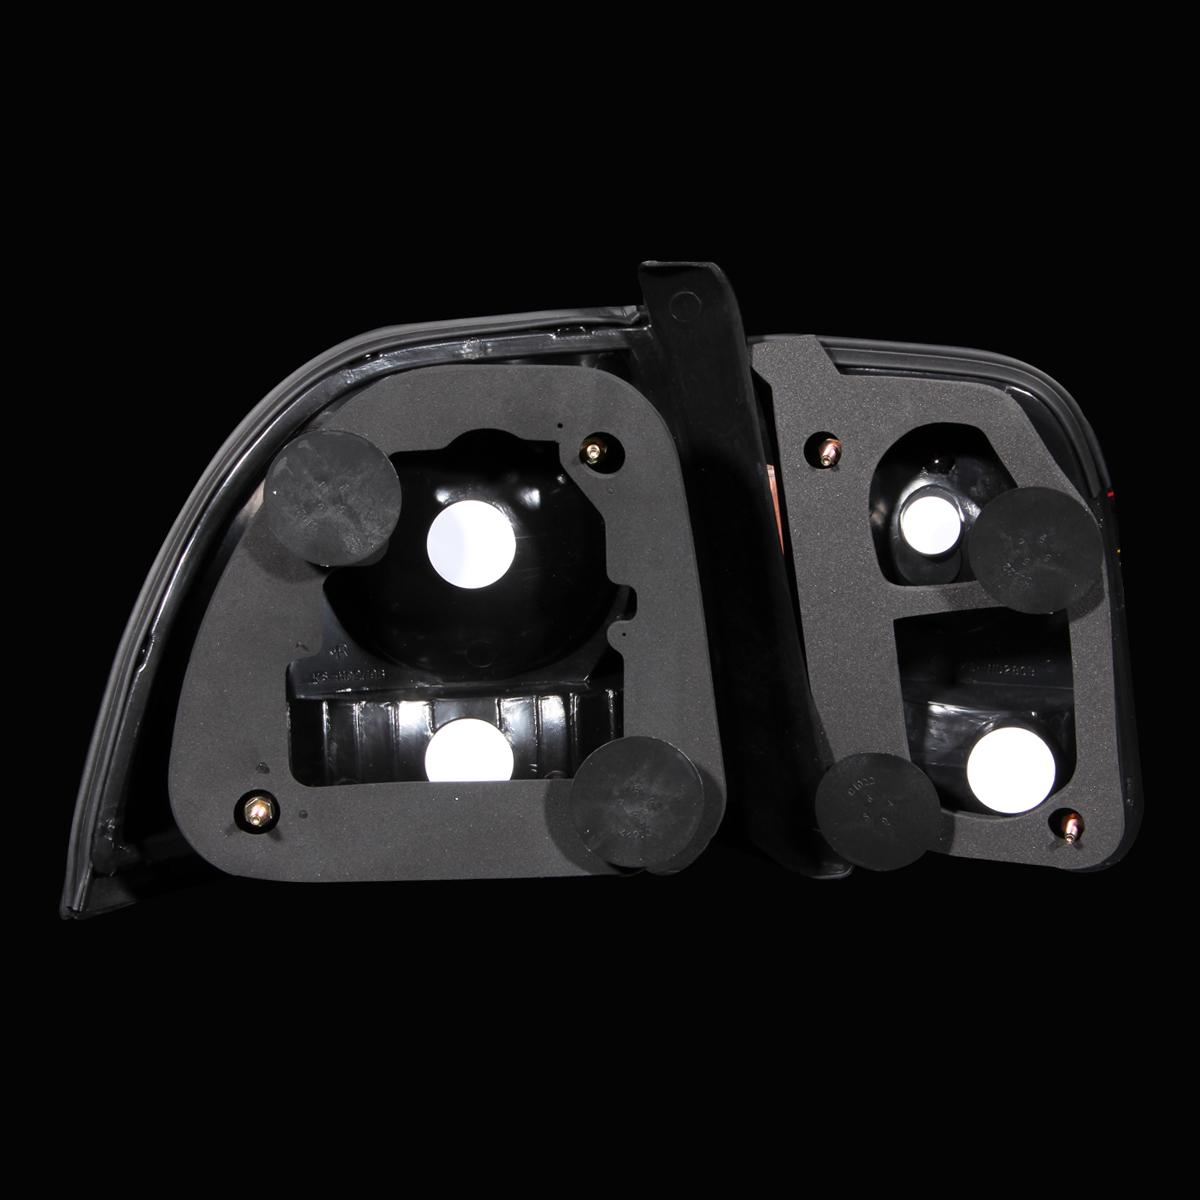 1996 1997 honda accord dx ex lx exl sedan coupe black rear brake tail lights set ebay. Black Bedroom Furniture Sets. Home Design Ideas